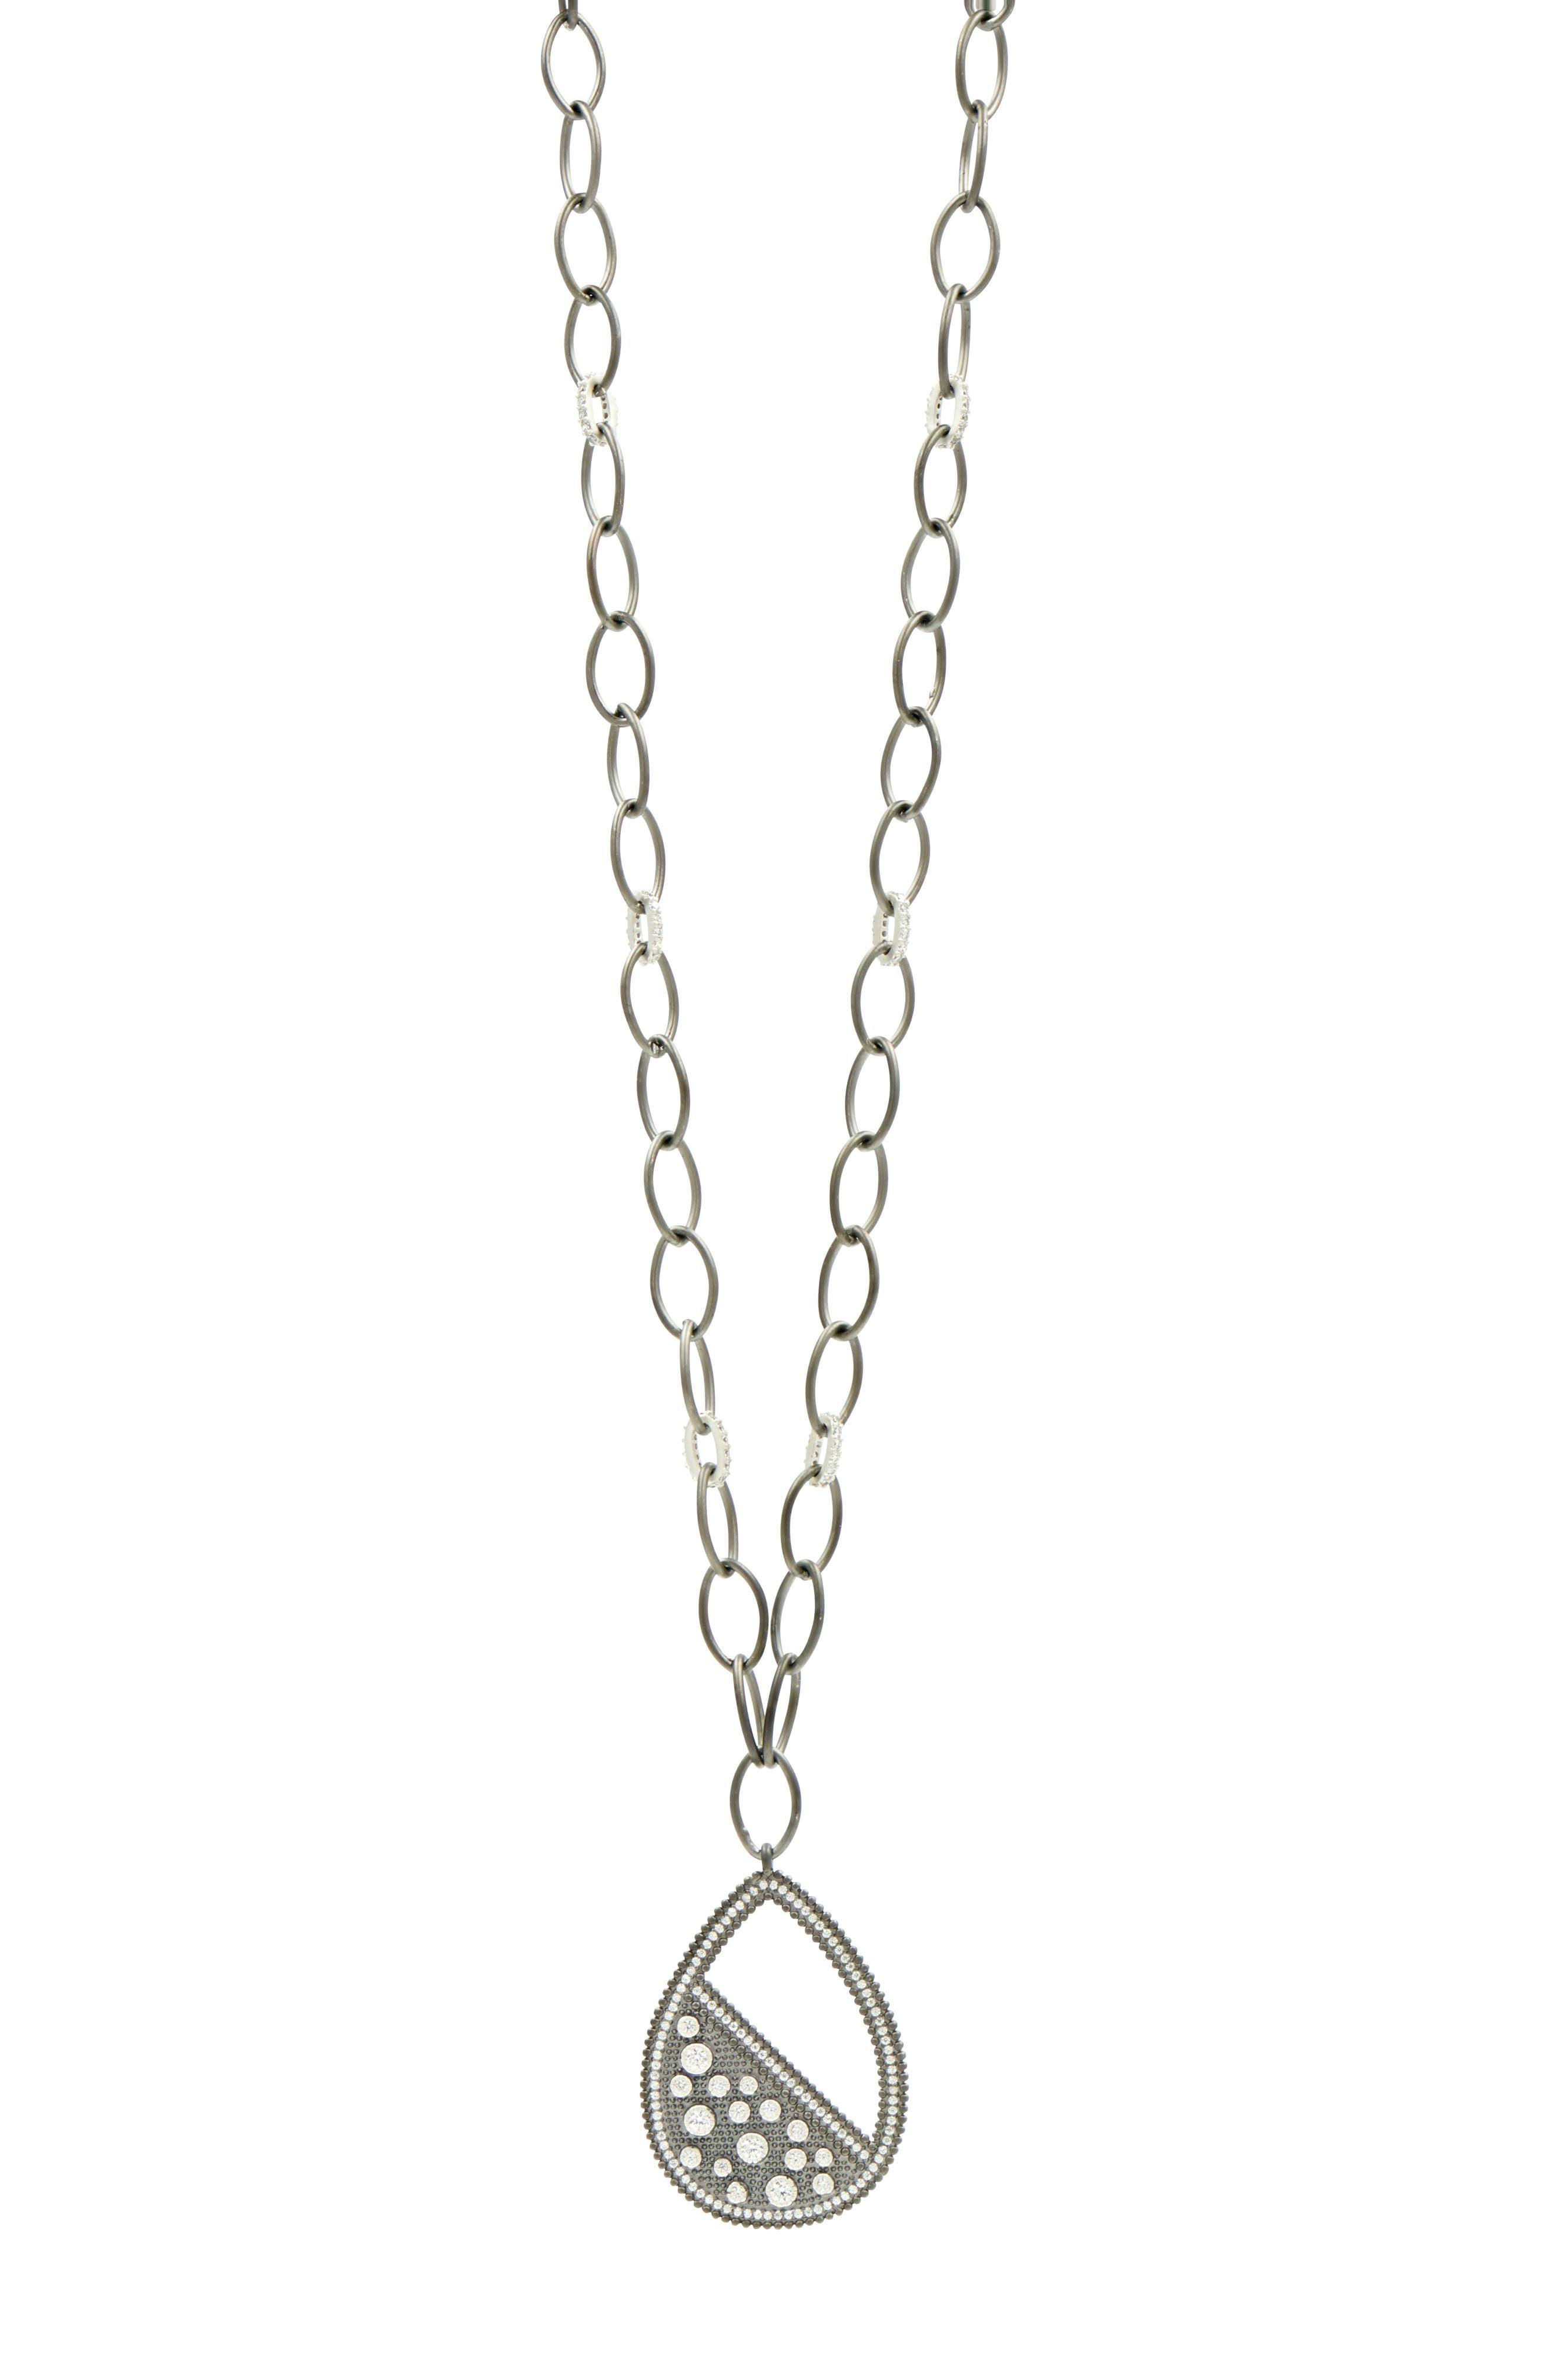 Industrial Finish Teardrop Necklace,                             Main thumbnail 1, color,                             Silver/ Black Rhodium